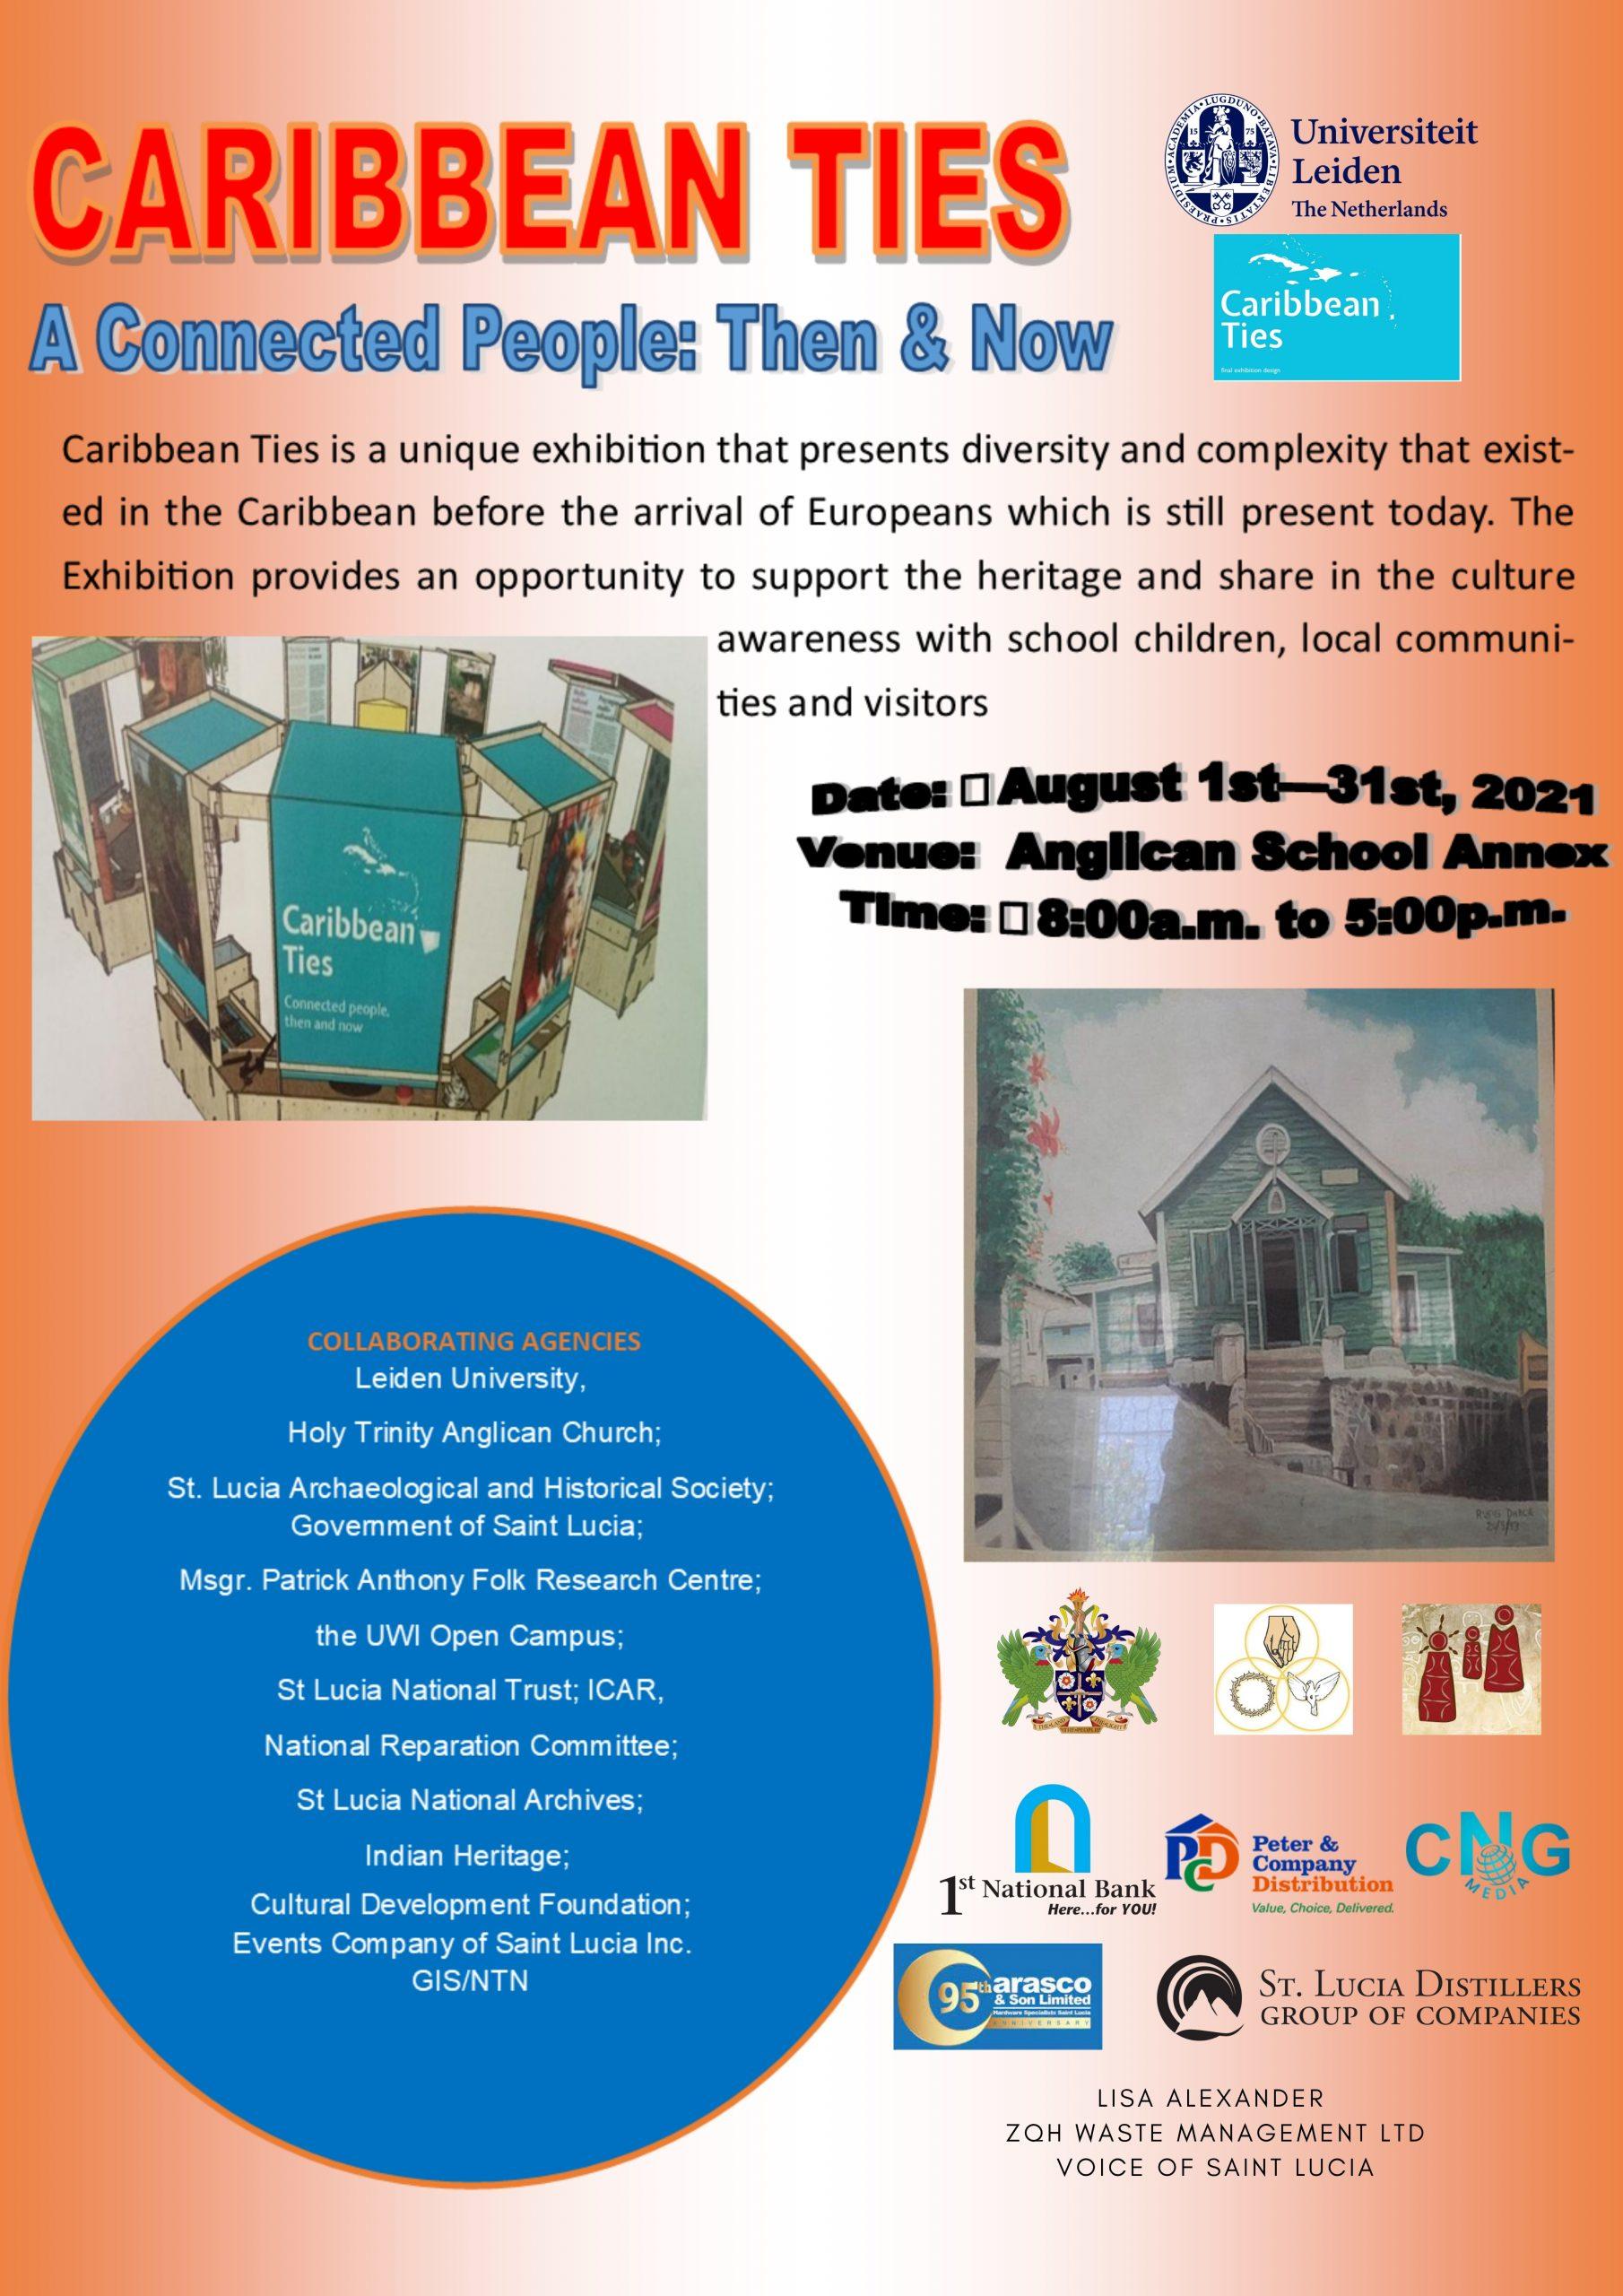 Caribbean News Global Caribbean-Ties_flyer-scaled Caribbean Ties Exhibition August 1-31, 2021